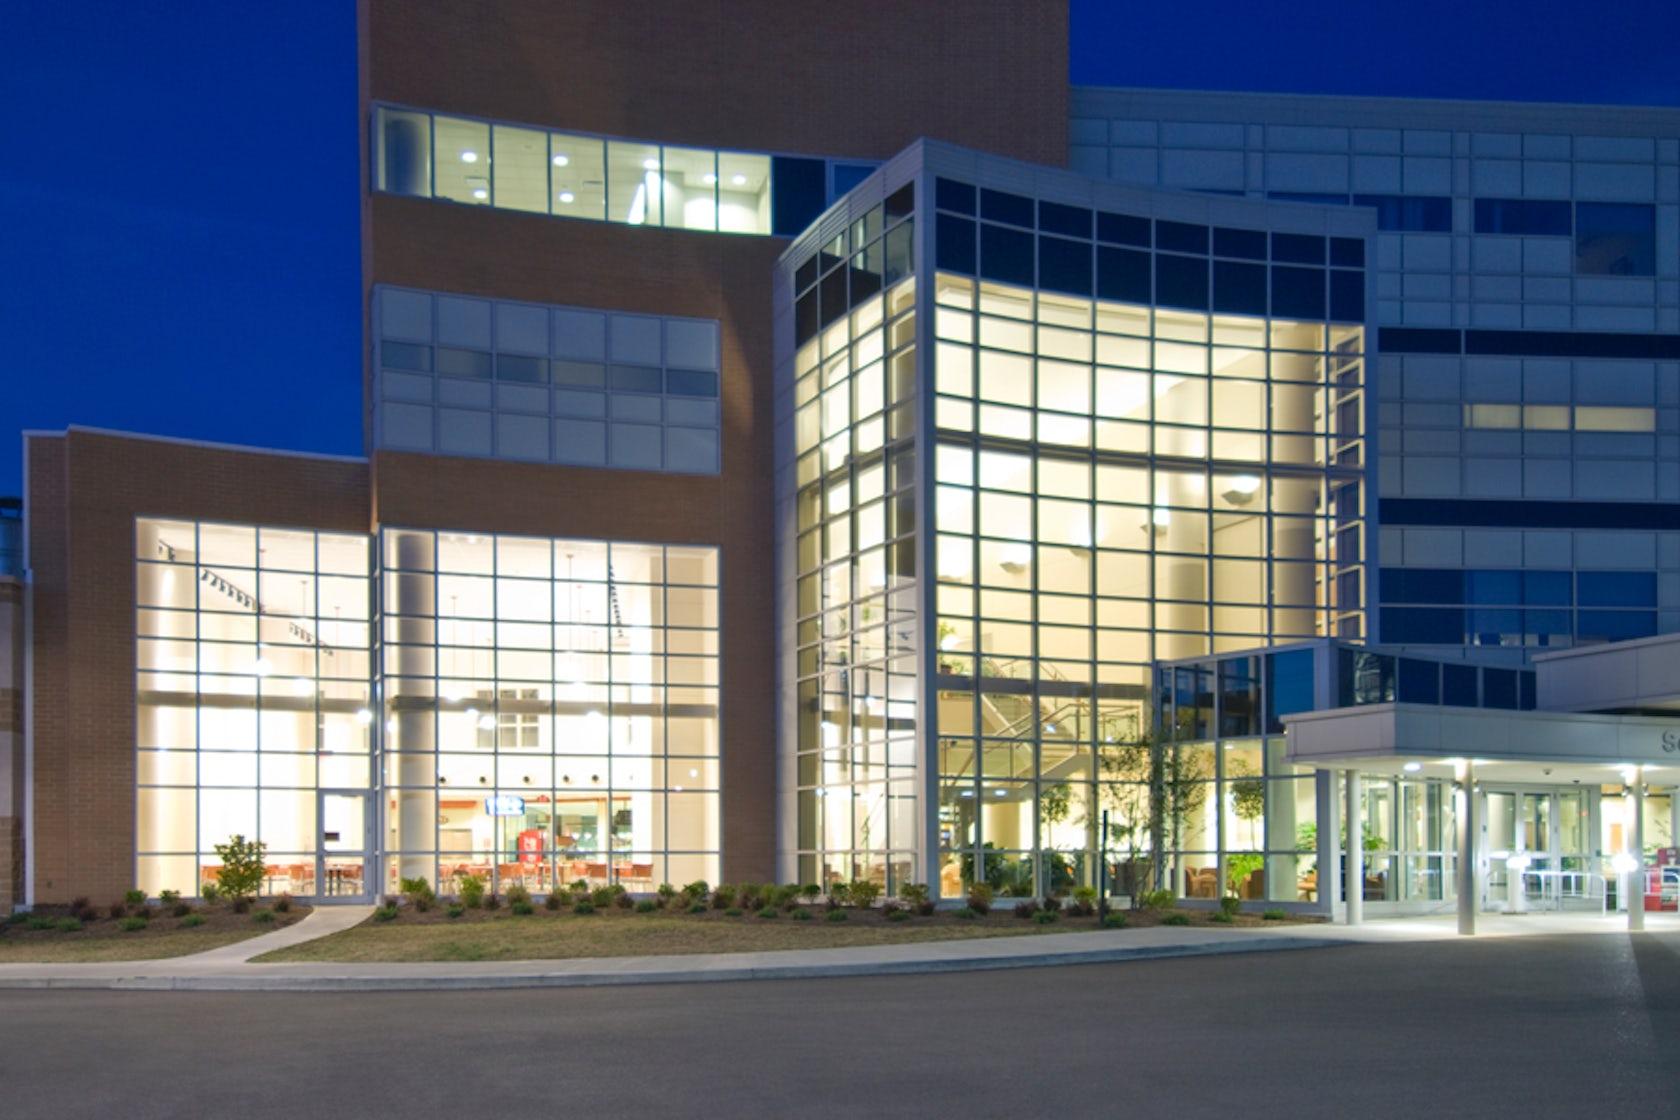 Camden Clark Memorial Hospital Reviews in Parkersburg, WV